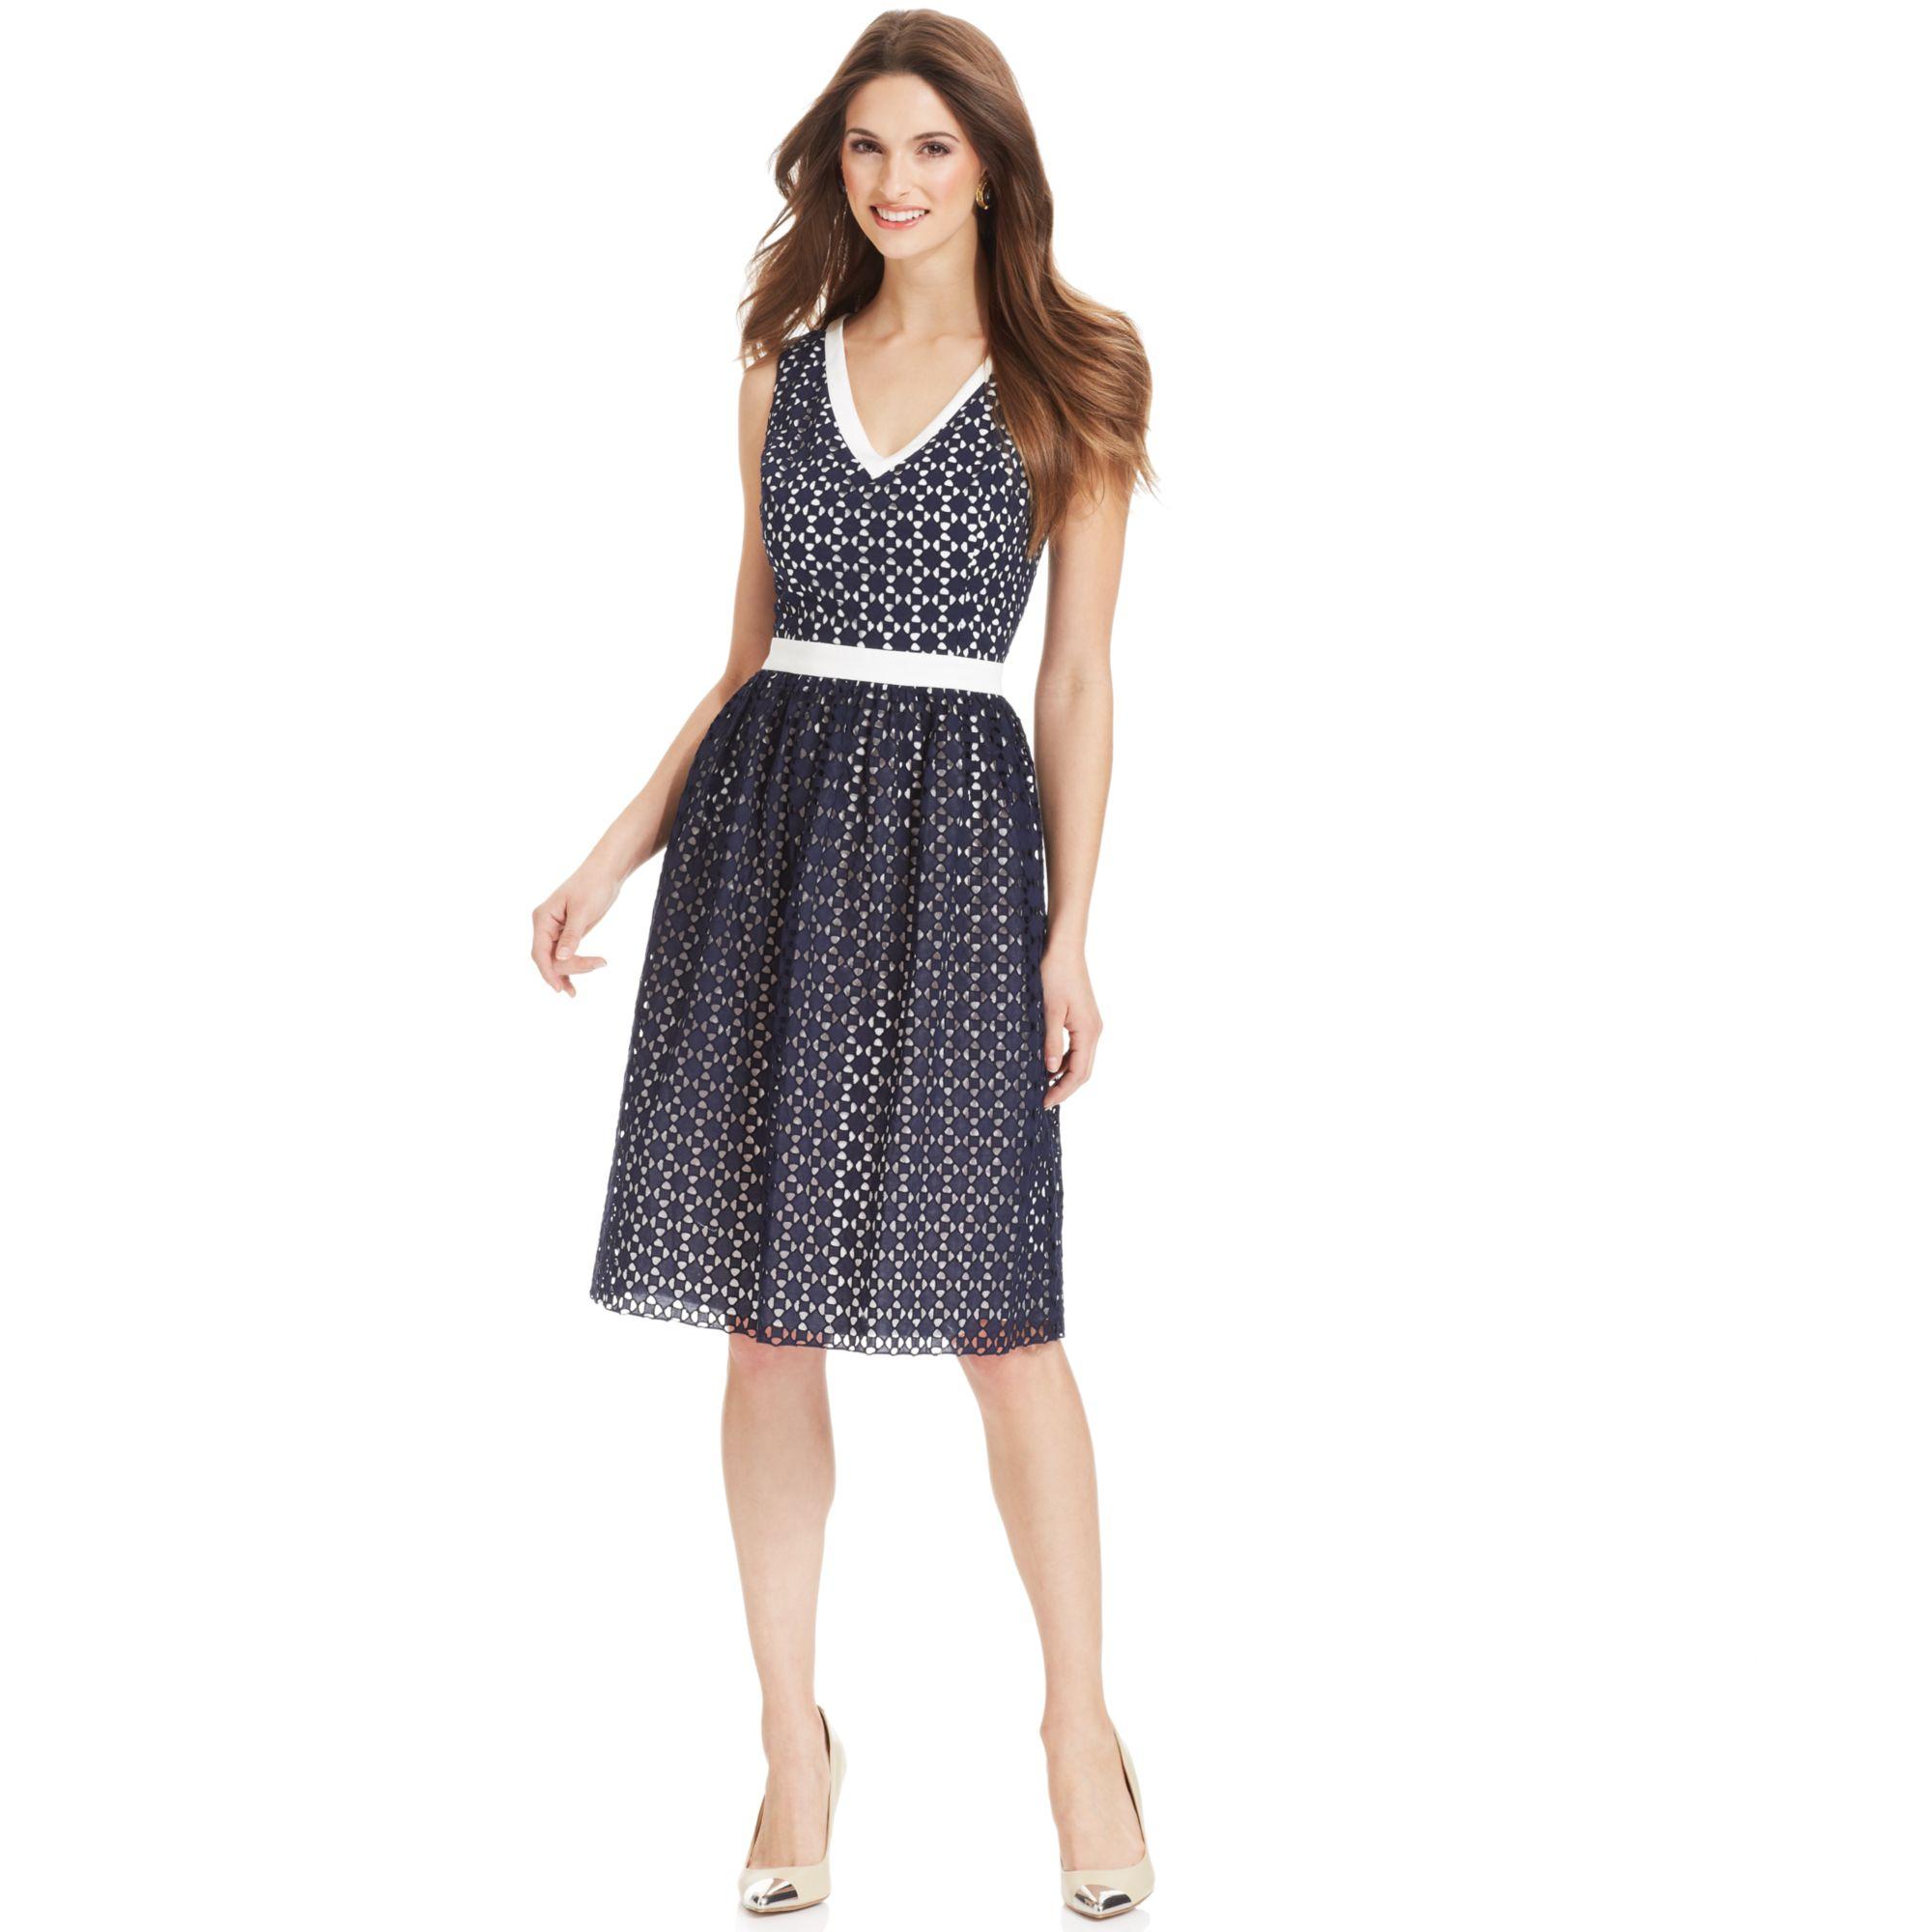 Anne Klein Petite Sleeveless Contrast Lace Dress In Blue